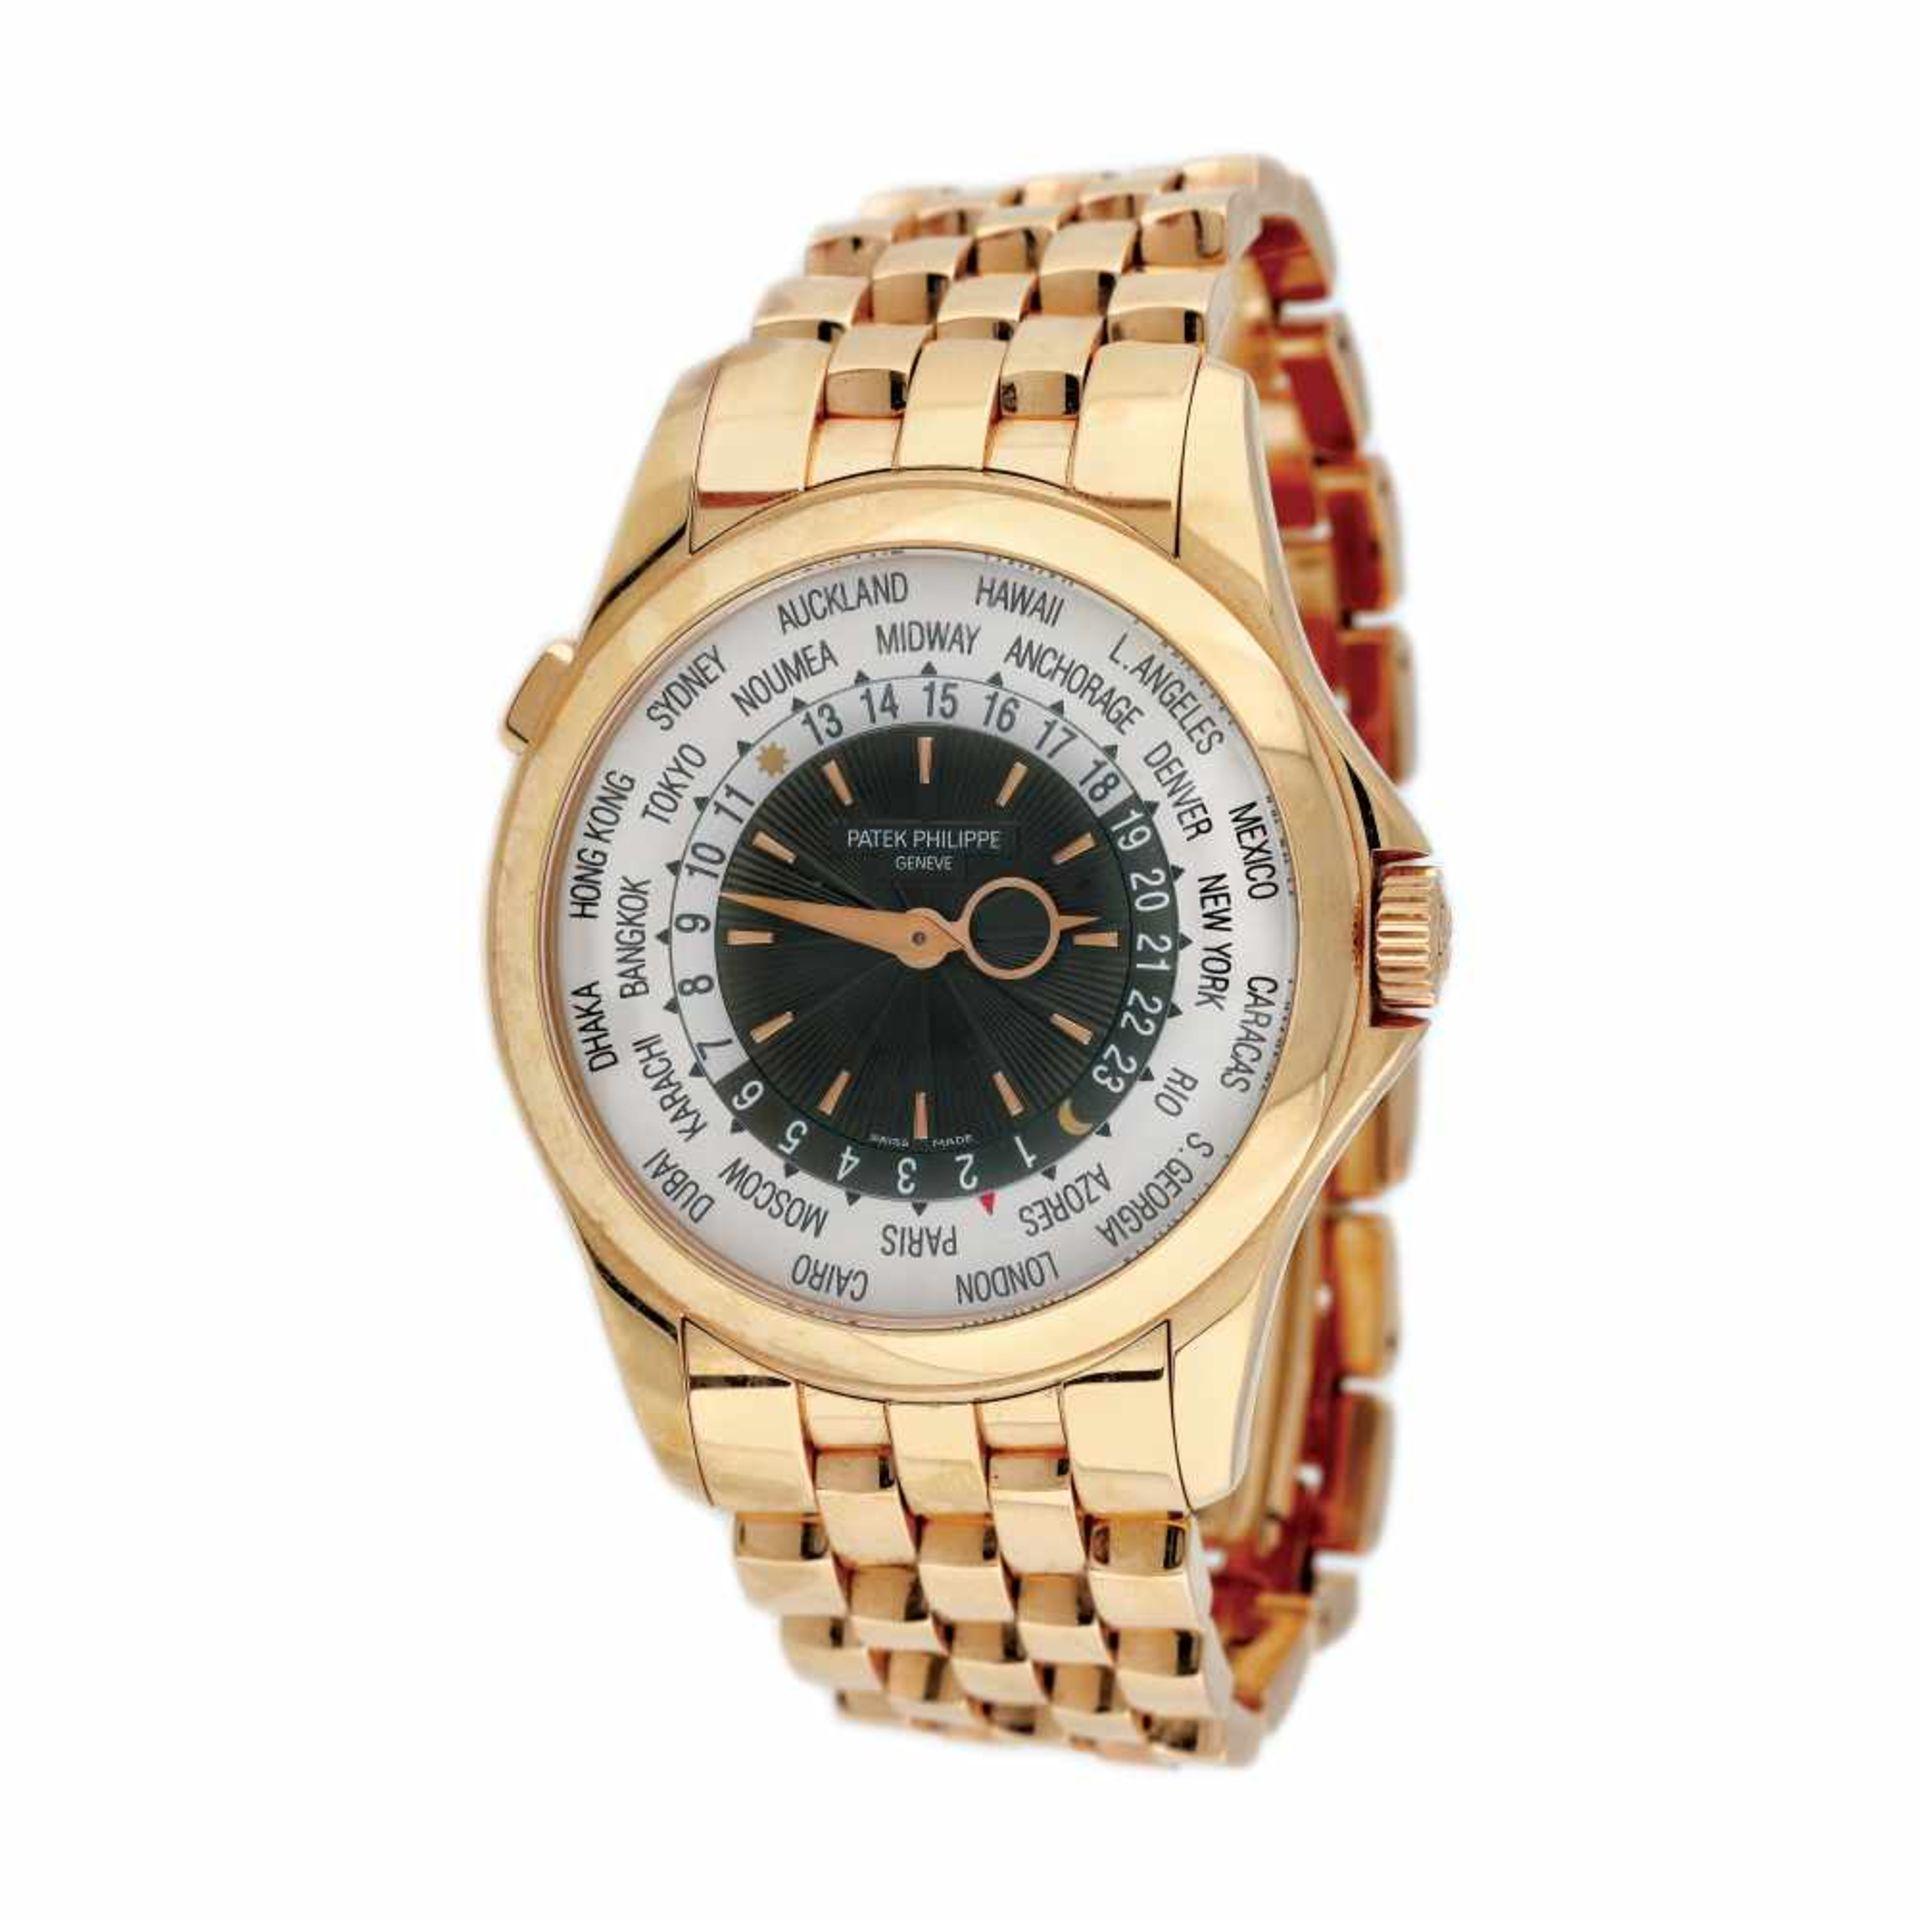 Patek Phillipe World Time wristwatch, gold, men, provenance documents and original box